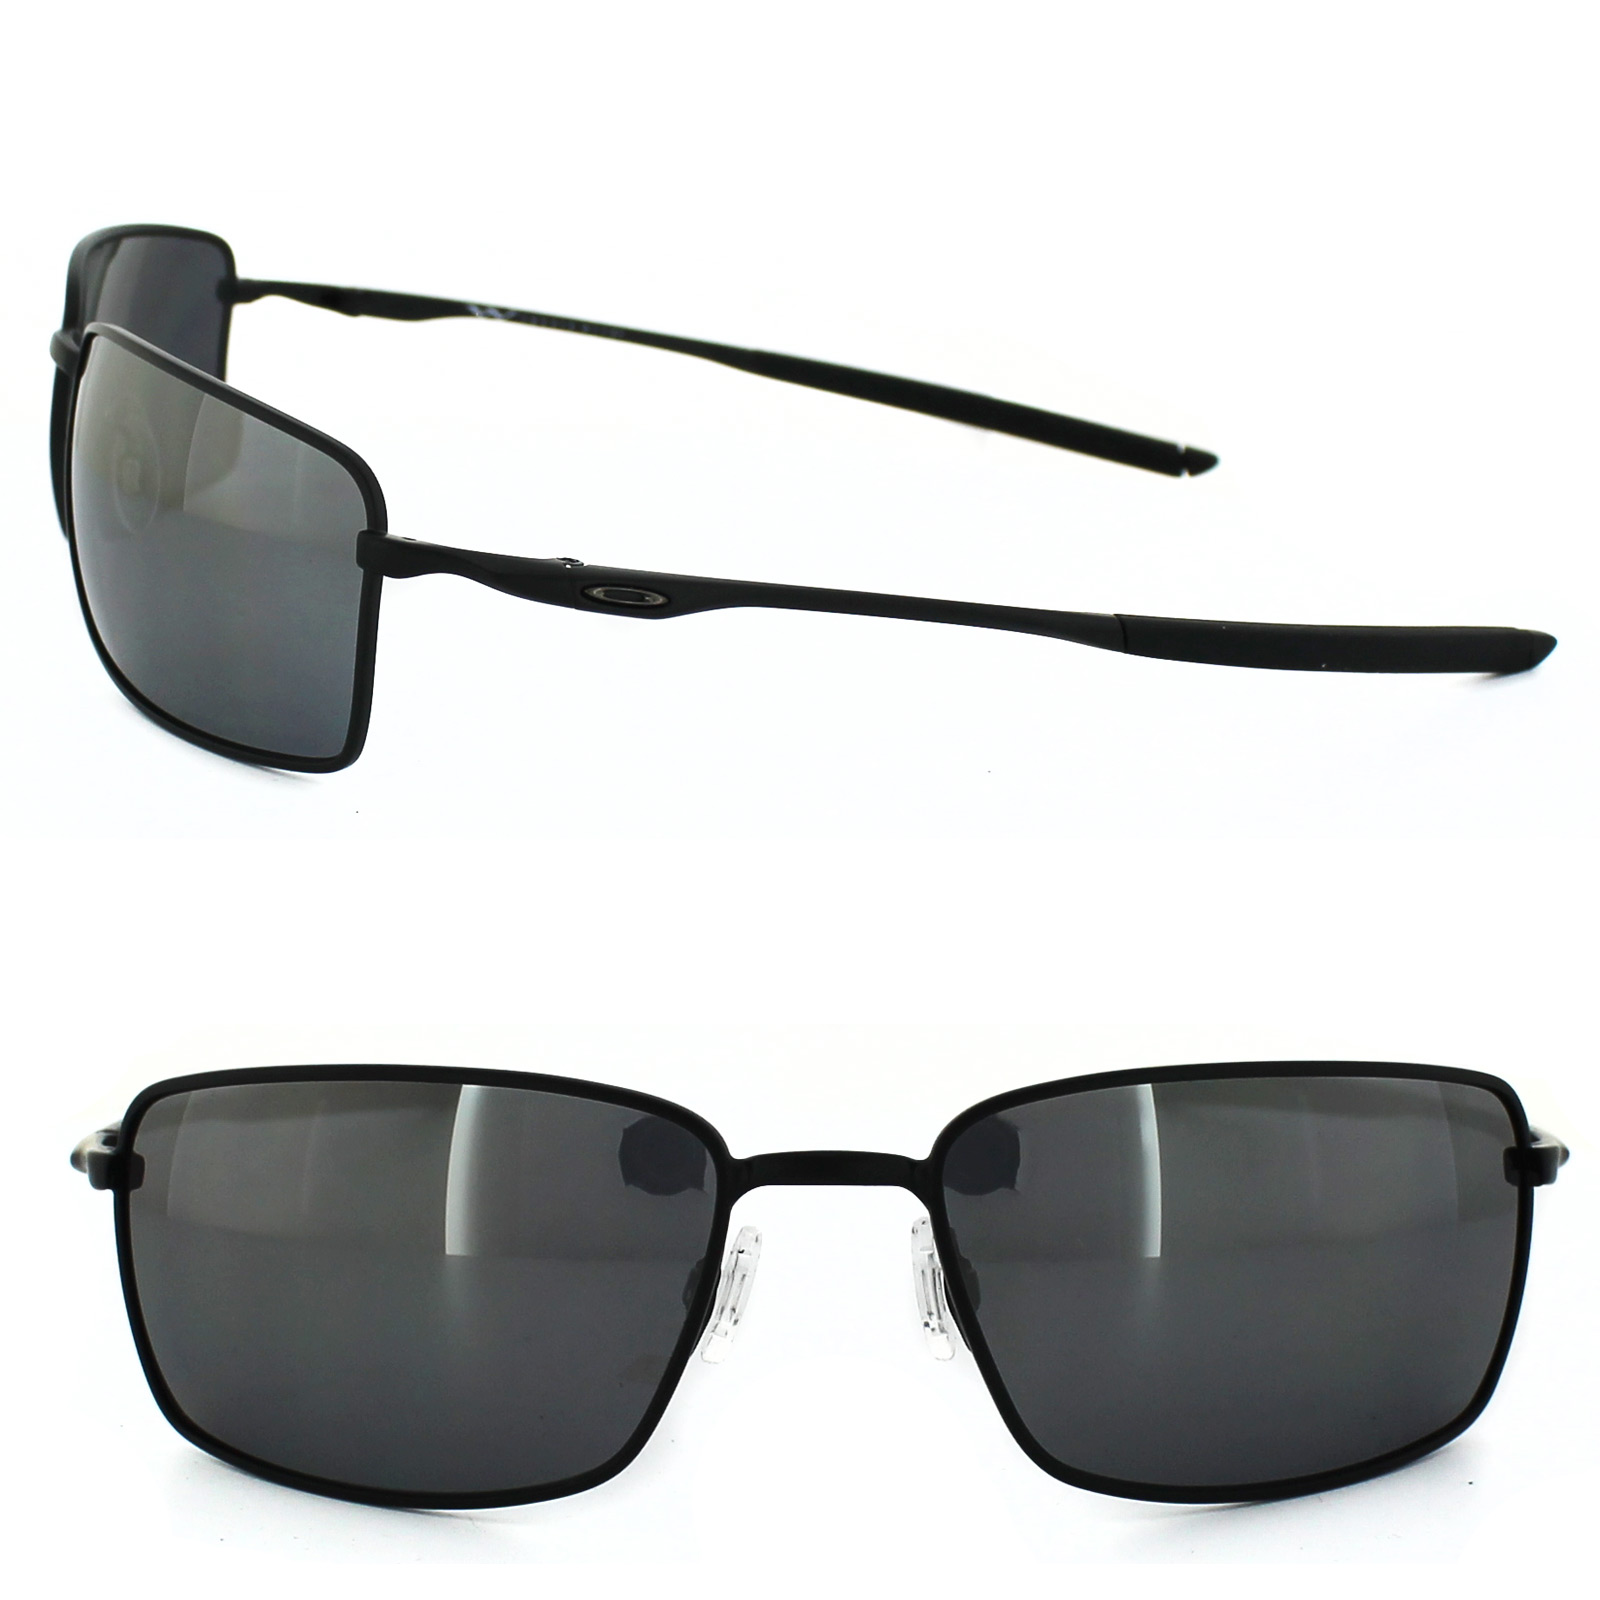 1c4a23af87 Sentinel Oakley Sunglasses Square Wire OO4075-05 Matt Black Black Iridium  Polarized